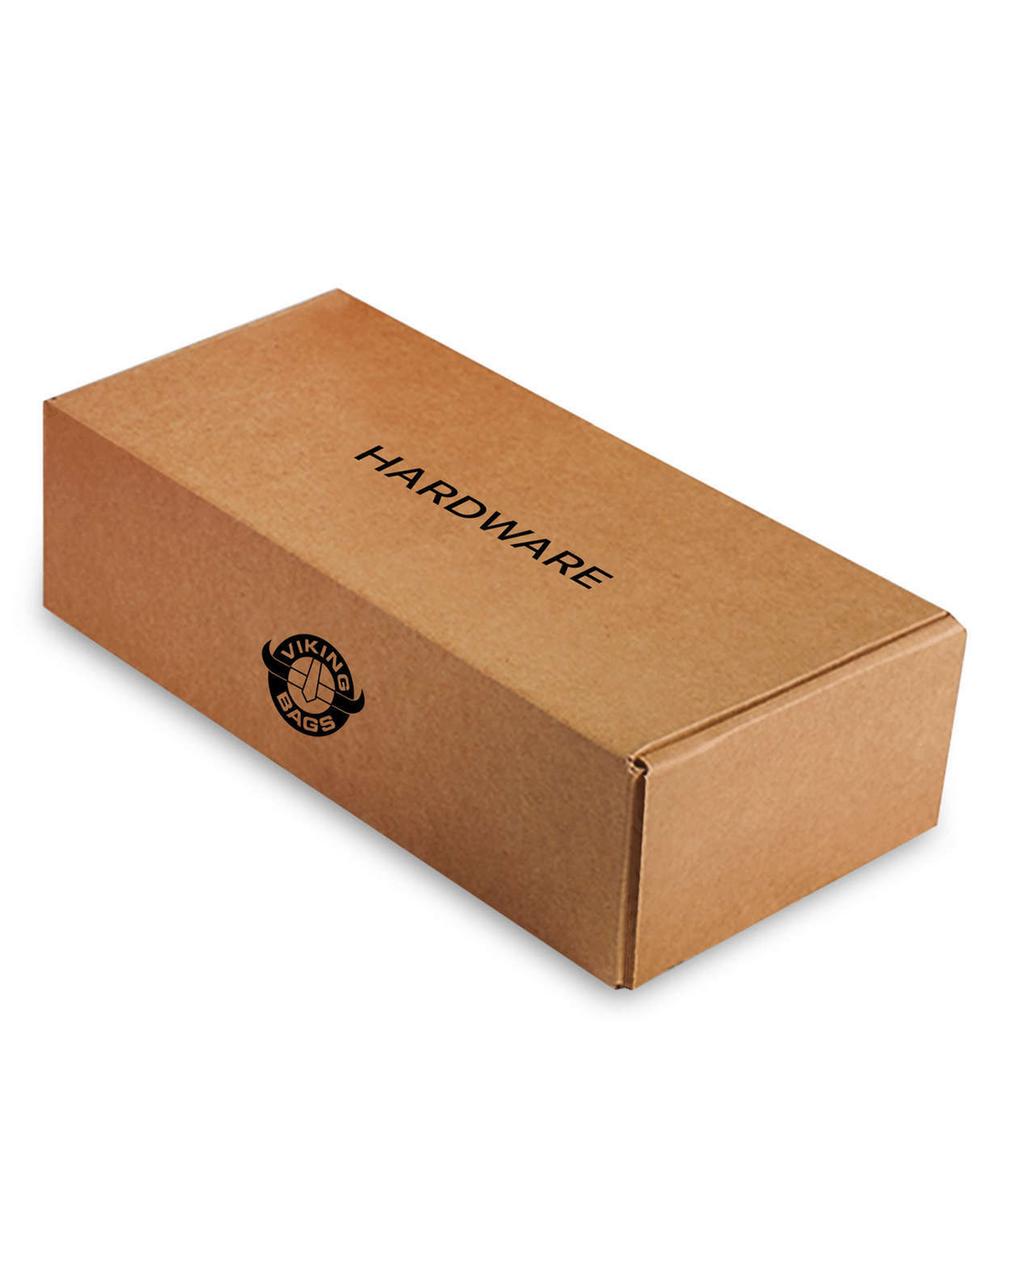 Boulevard C90, VL1500 SS Side Pocket Studded Saddlebags Hardware Box